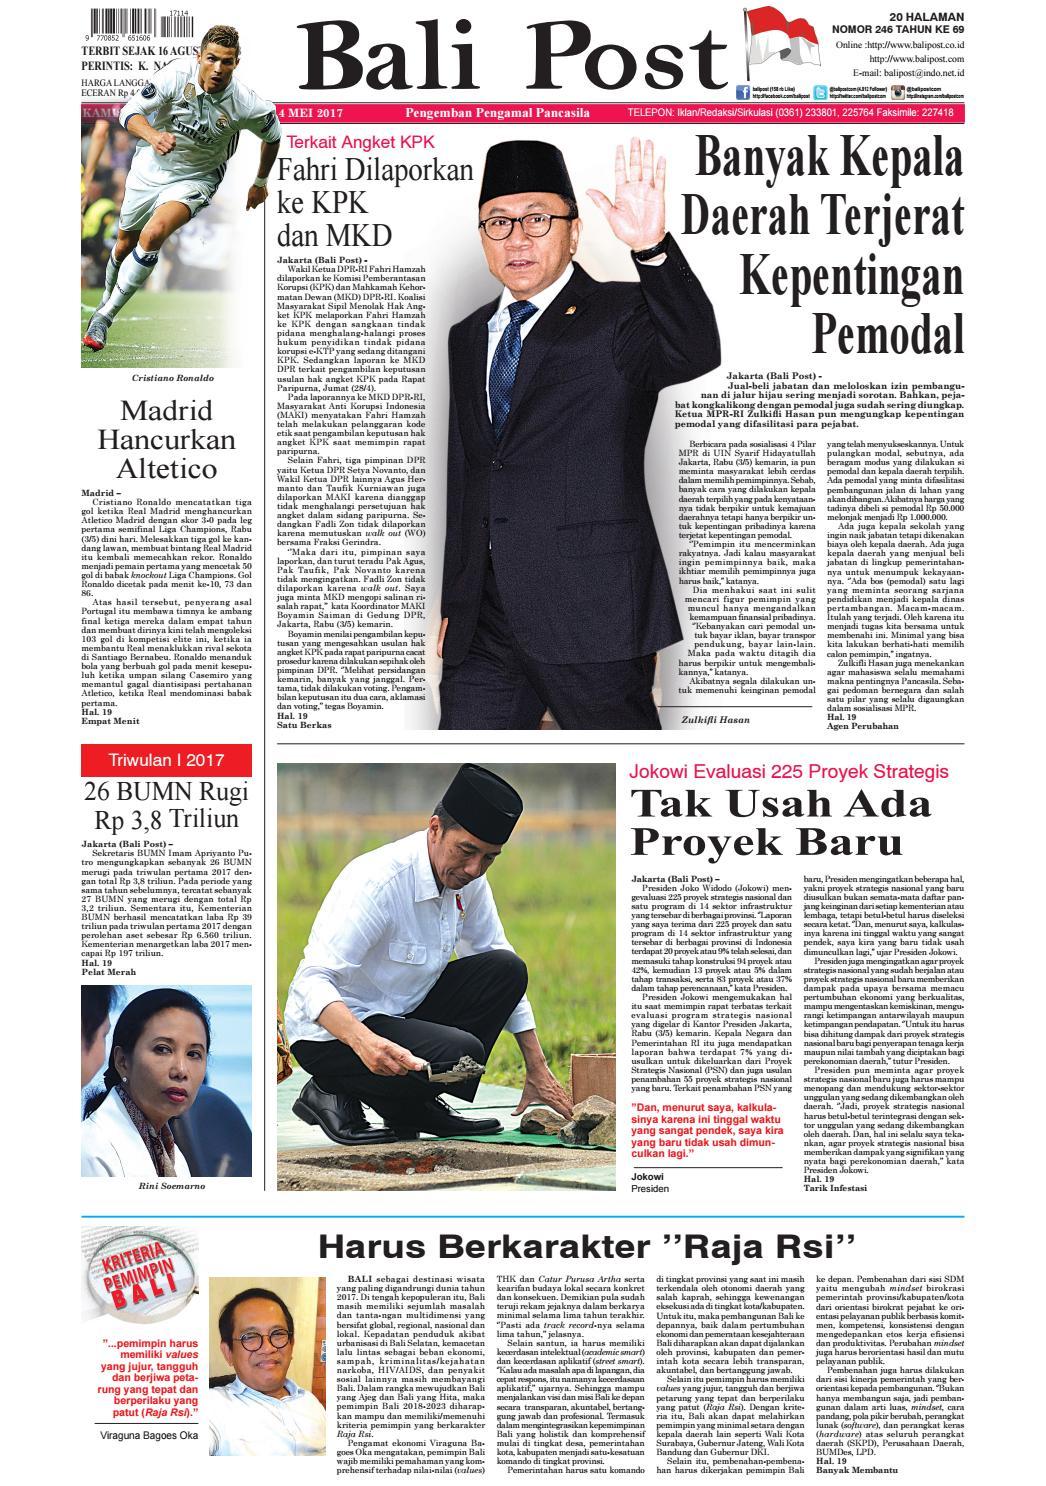 Edisi 04 Mei 2017 Balipostcom By E Paper Kmb Issuu Produk Ukm Bumn Bahan Songket Sulam Katun Merah